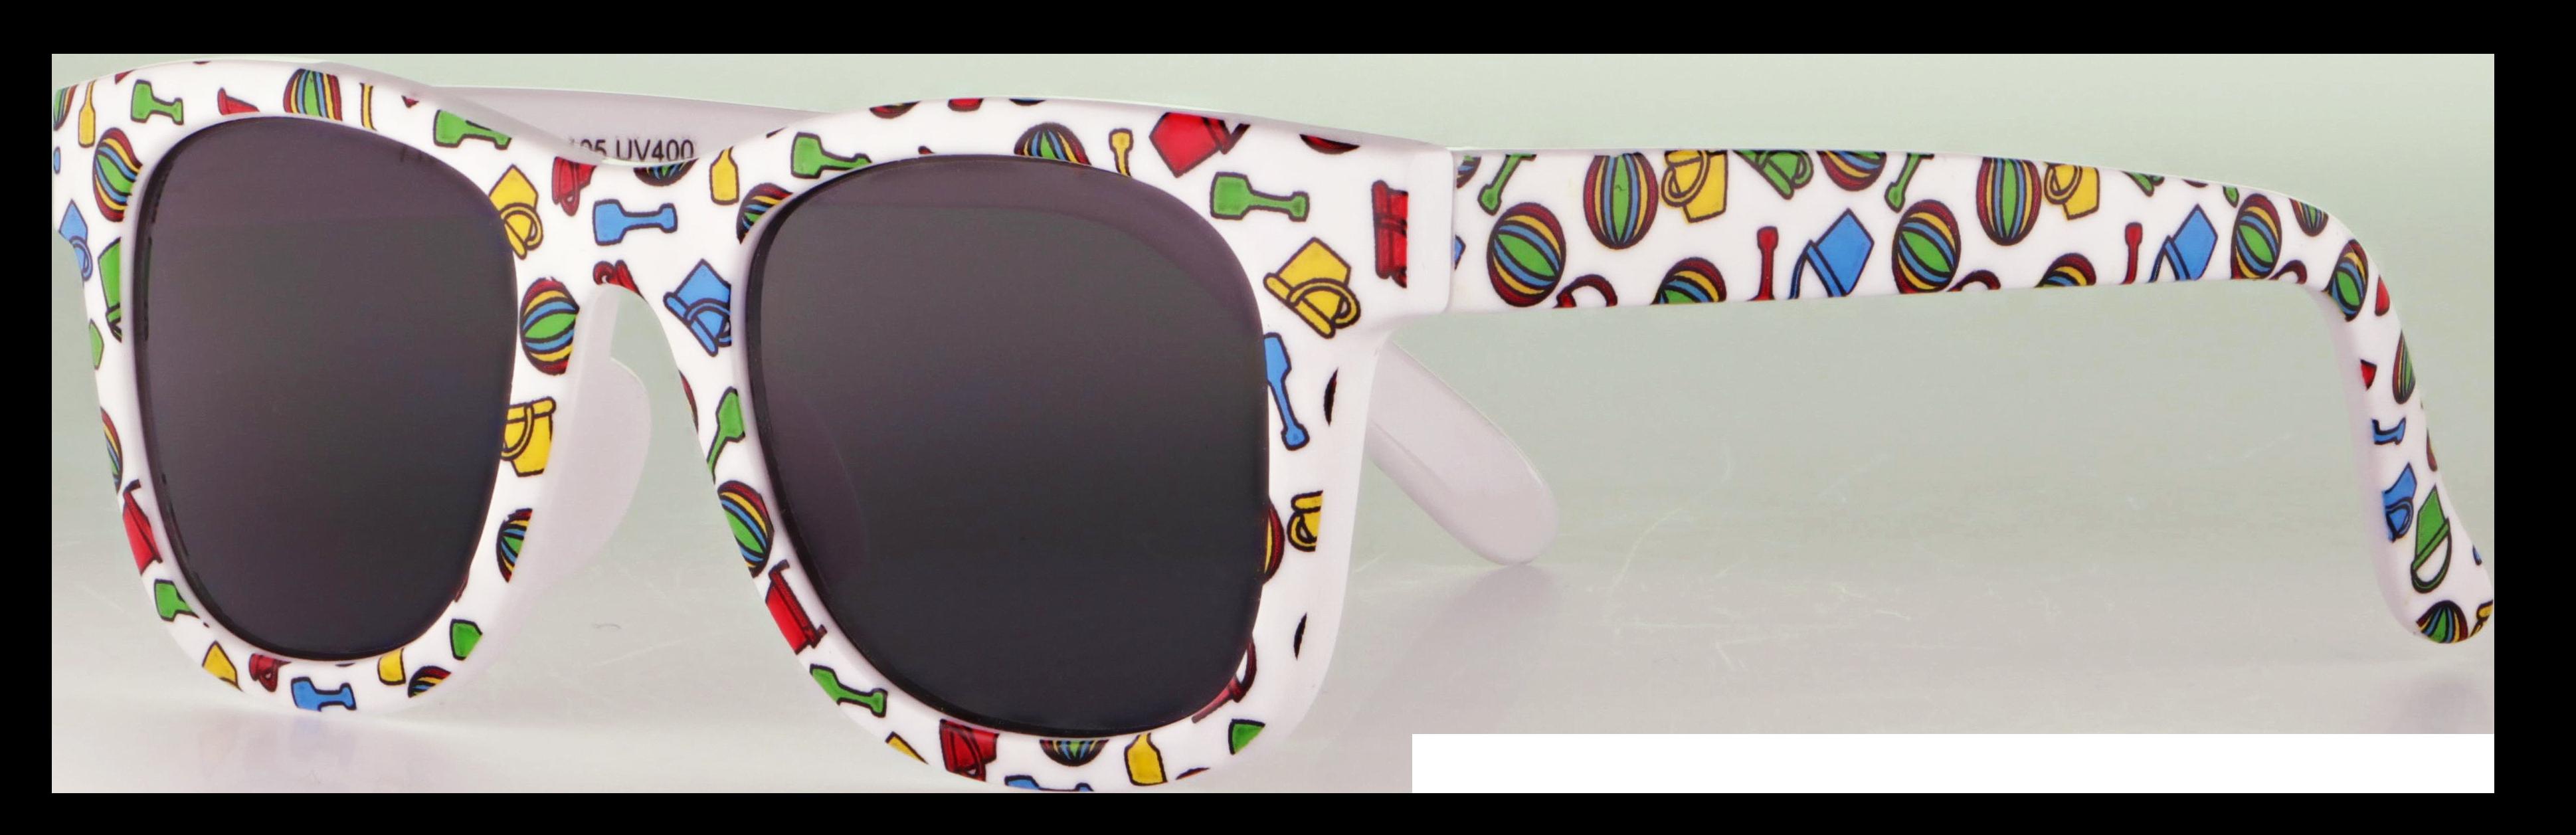 abele optik Kindersonnenbrille 718804